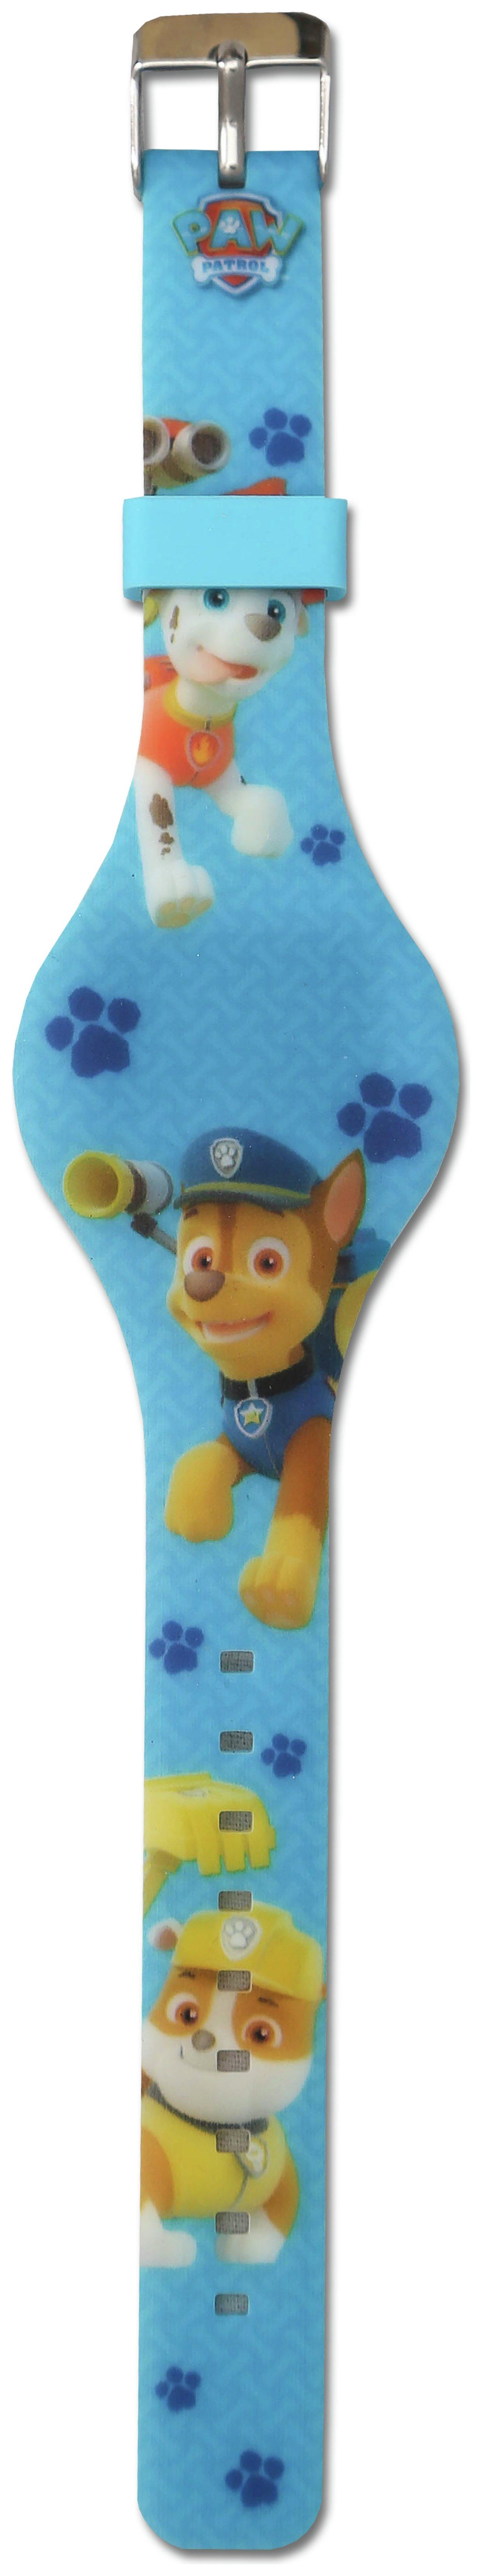 PAW Patrol Watch - Blue